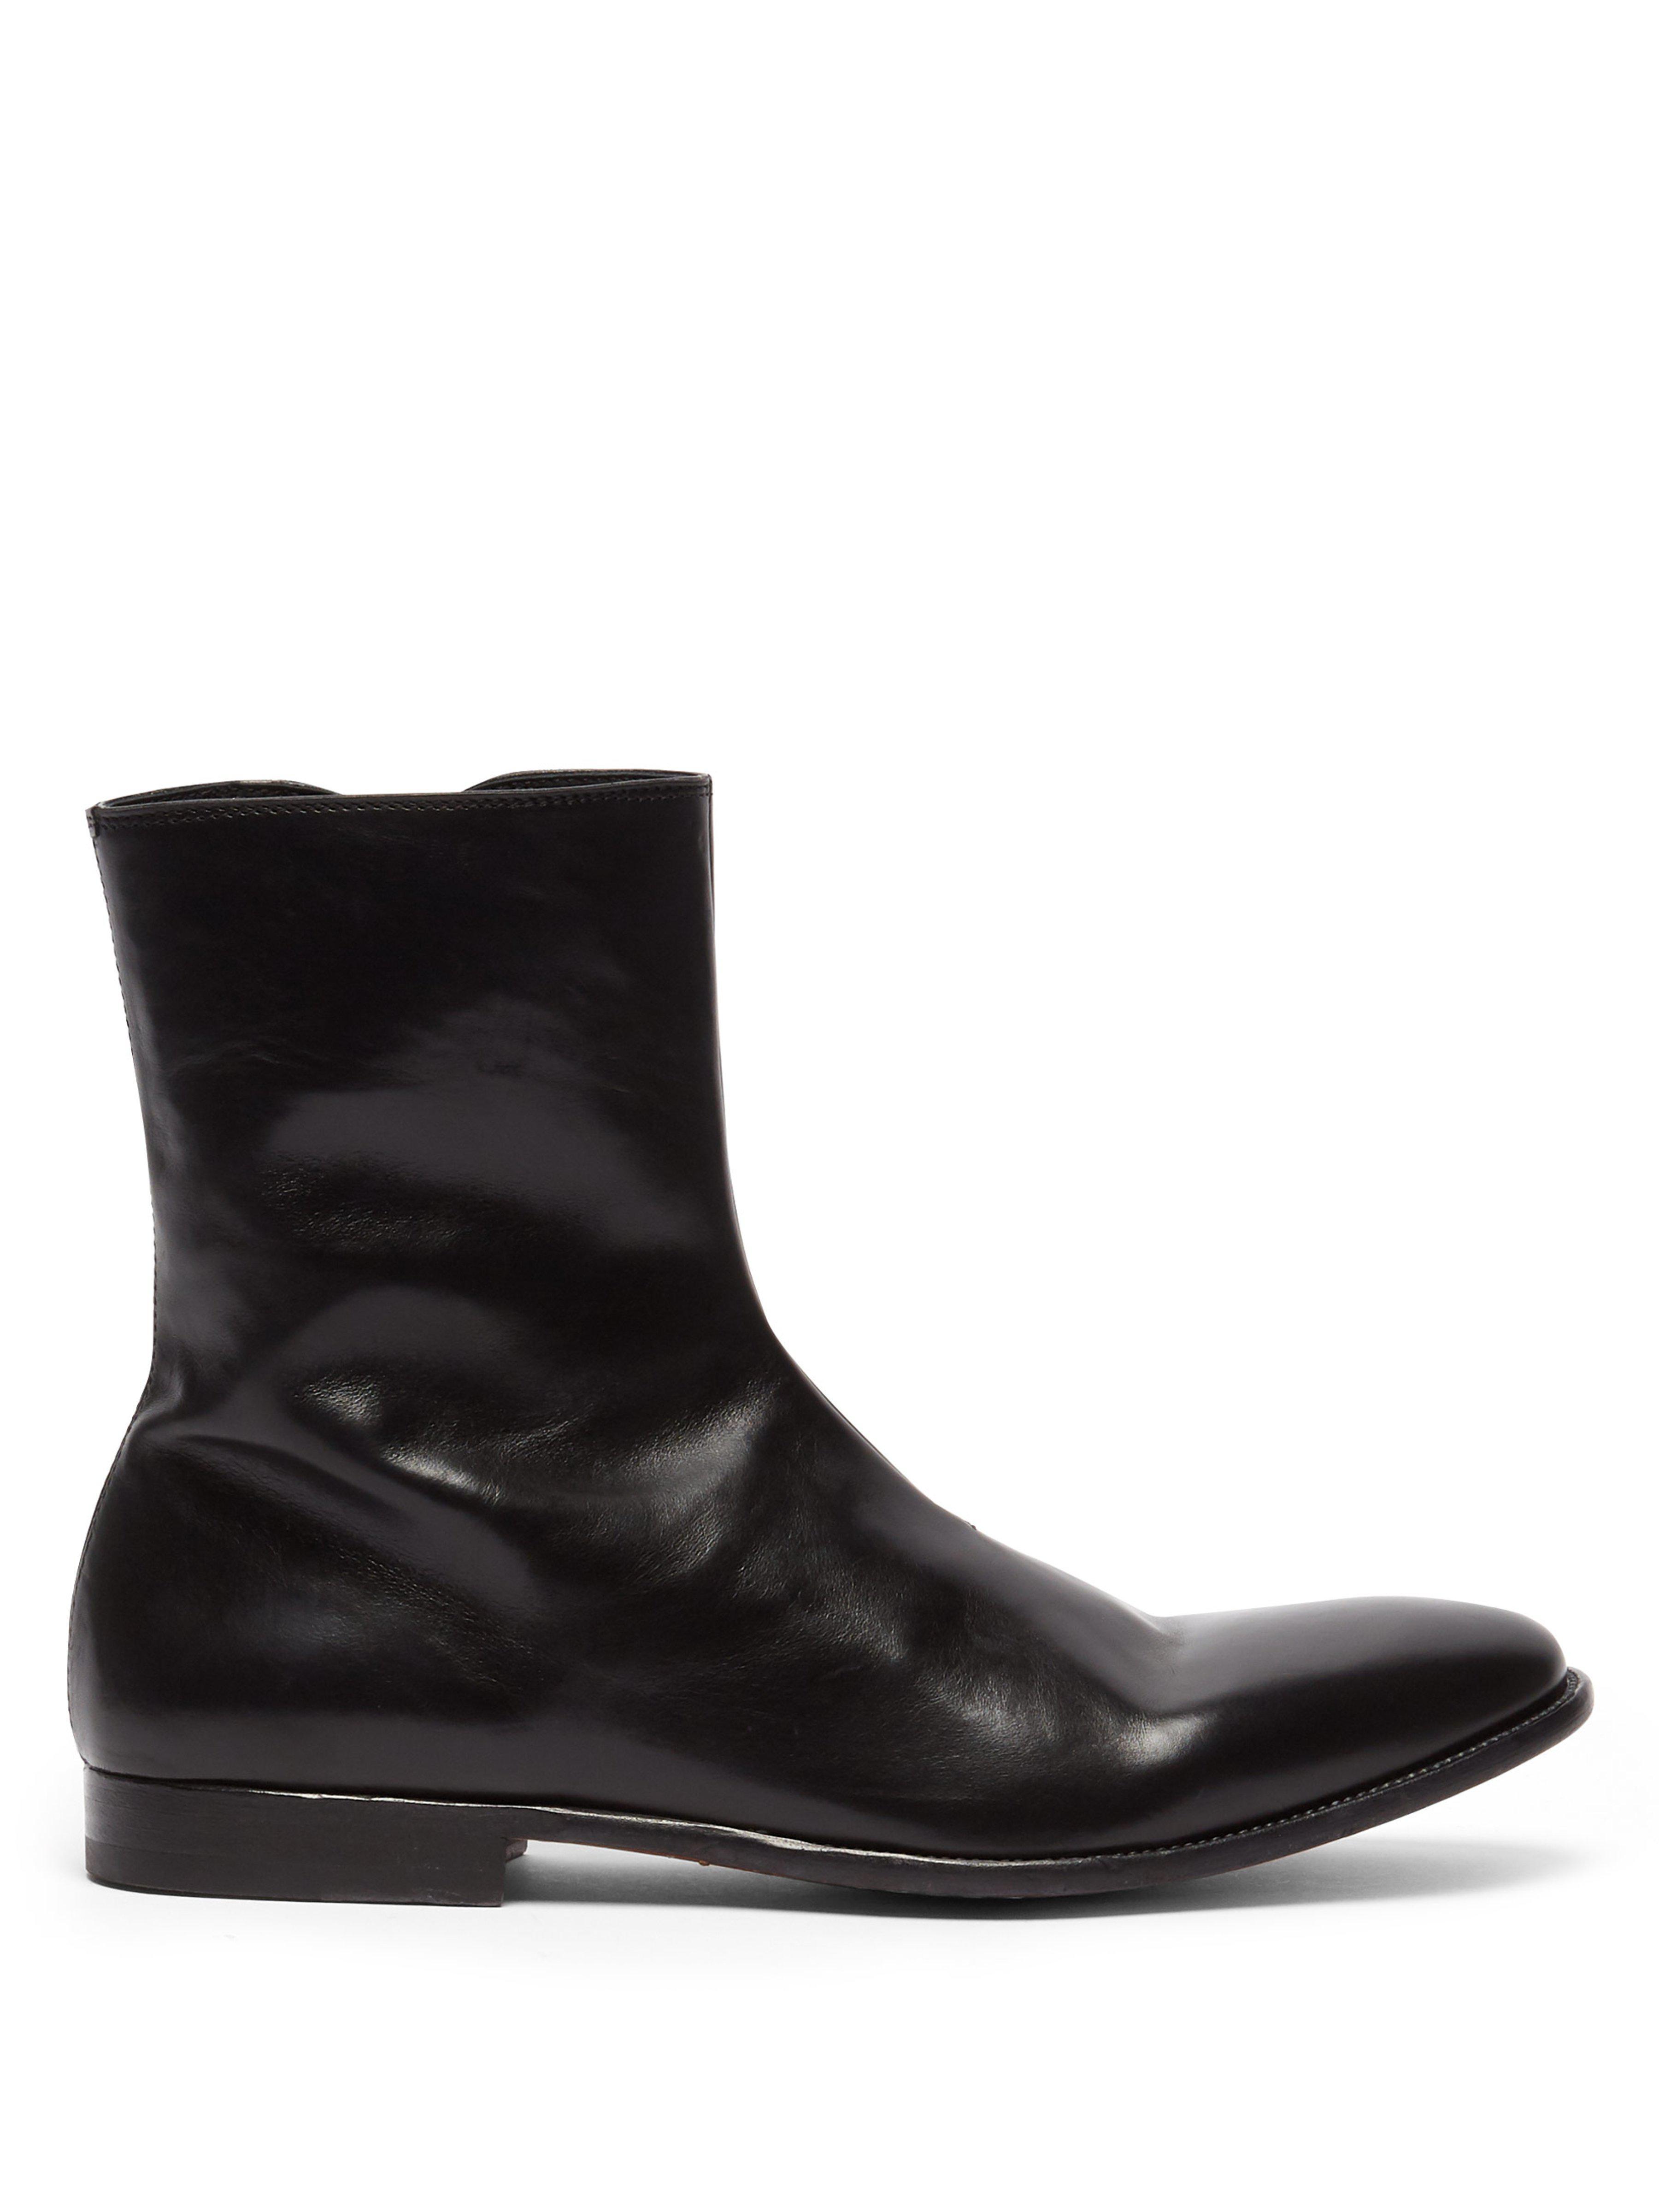 af58977bec1a6 Alexander Mcqueen Washed Leather Ankle Boots in Black for Men - Lyst